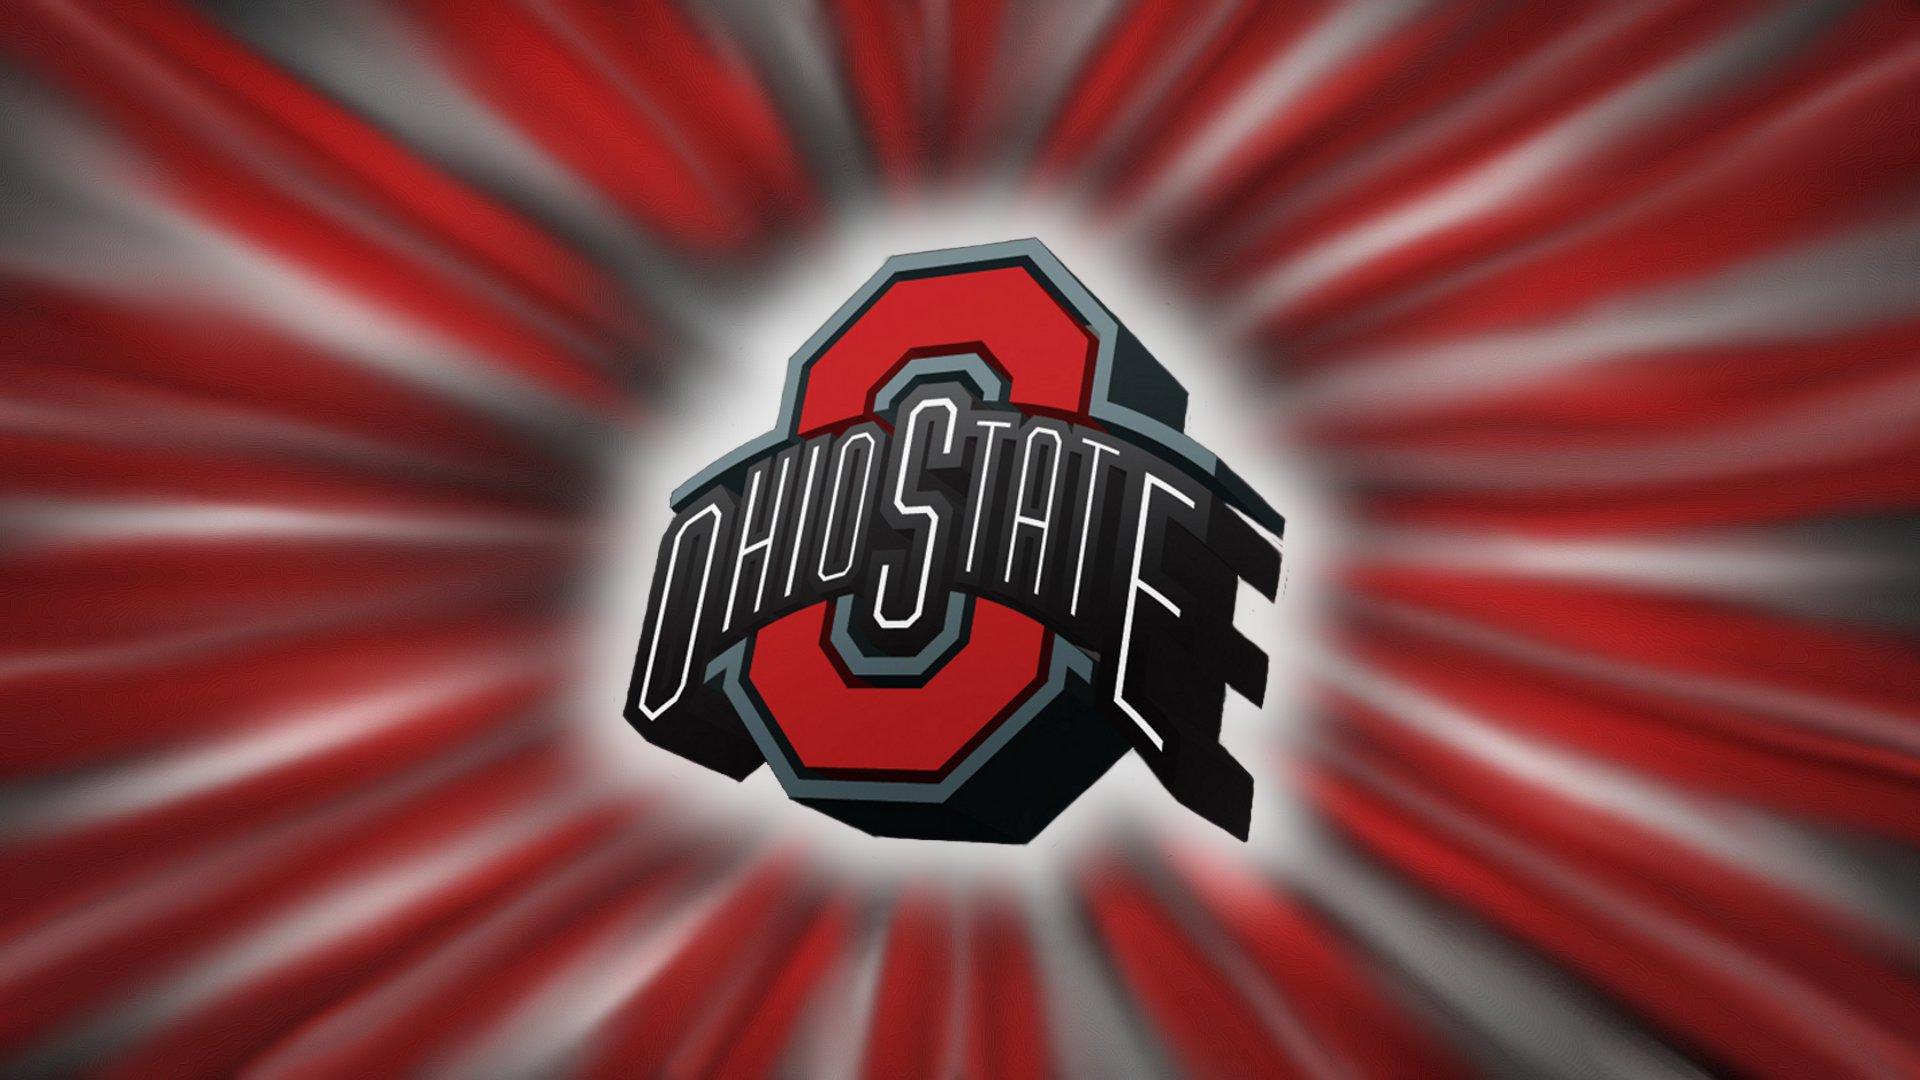 Ohio State Football images OSU Wallpaper 78 wallpaper photos 29034128 1920x1080